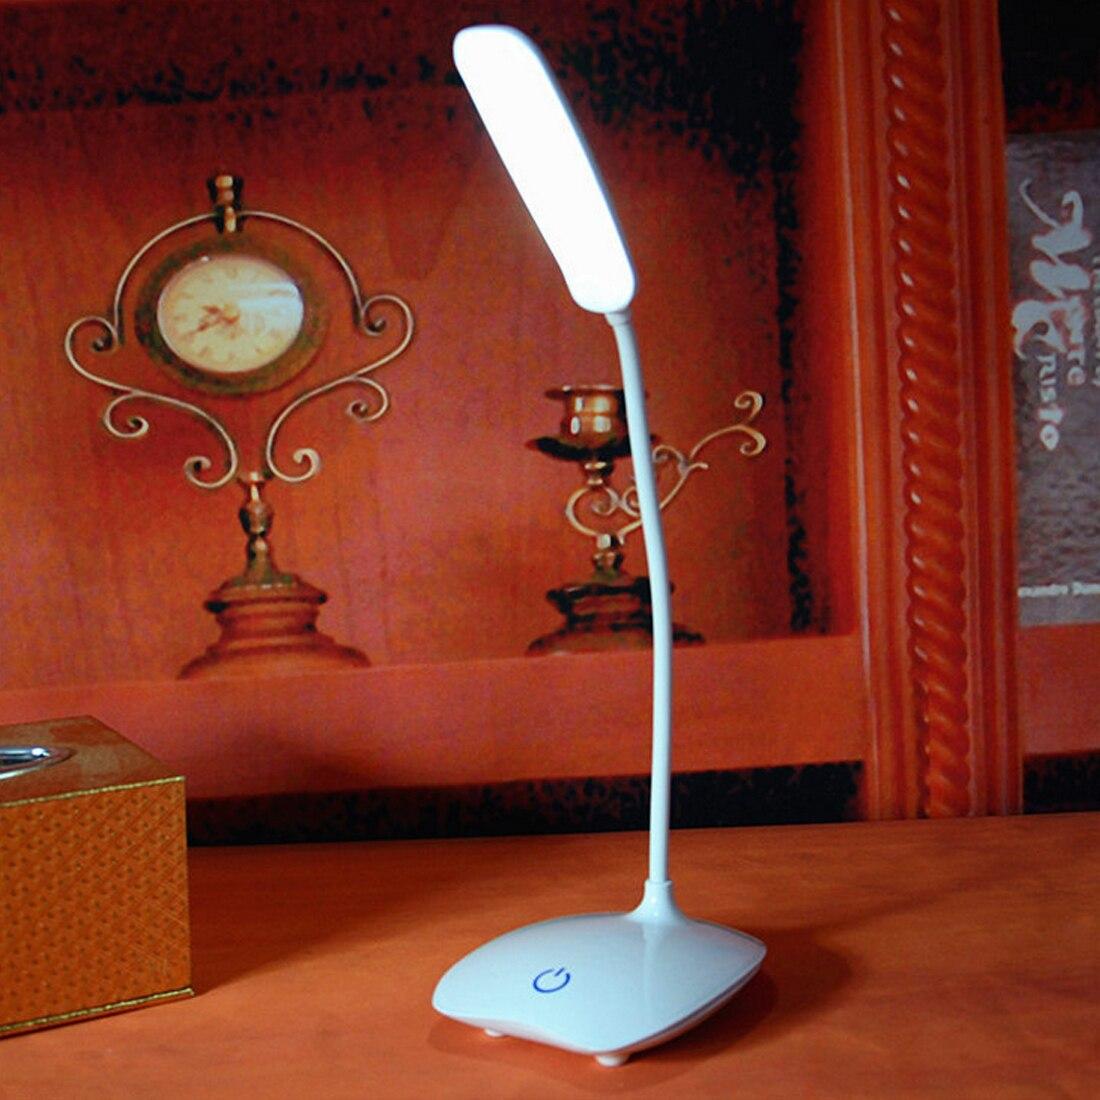 Escritorios LED recargables USB Lámpara de mesa intensidad ajustable luz de lectura Interruptor táctil lámparas de escritorio